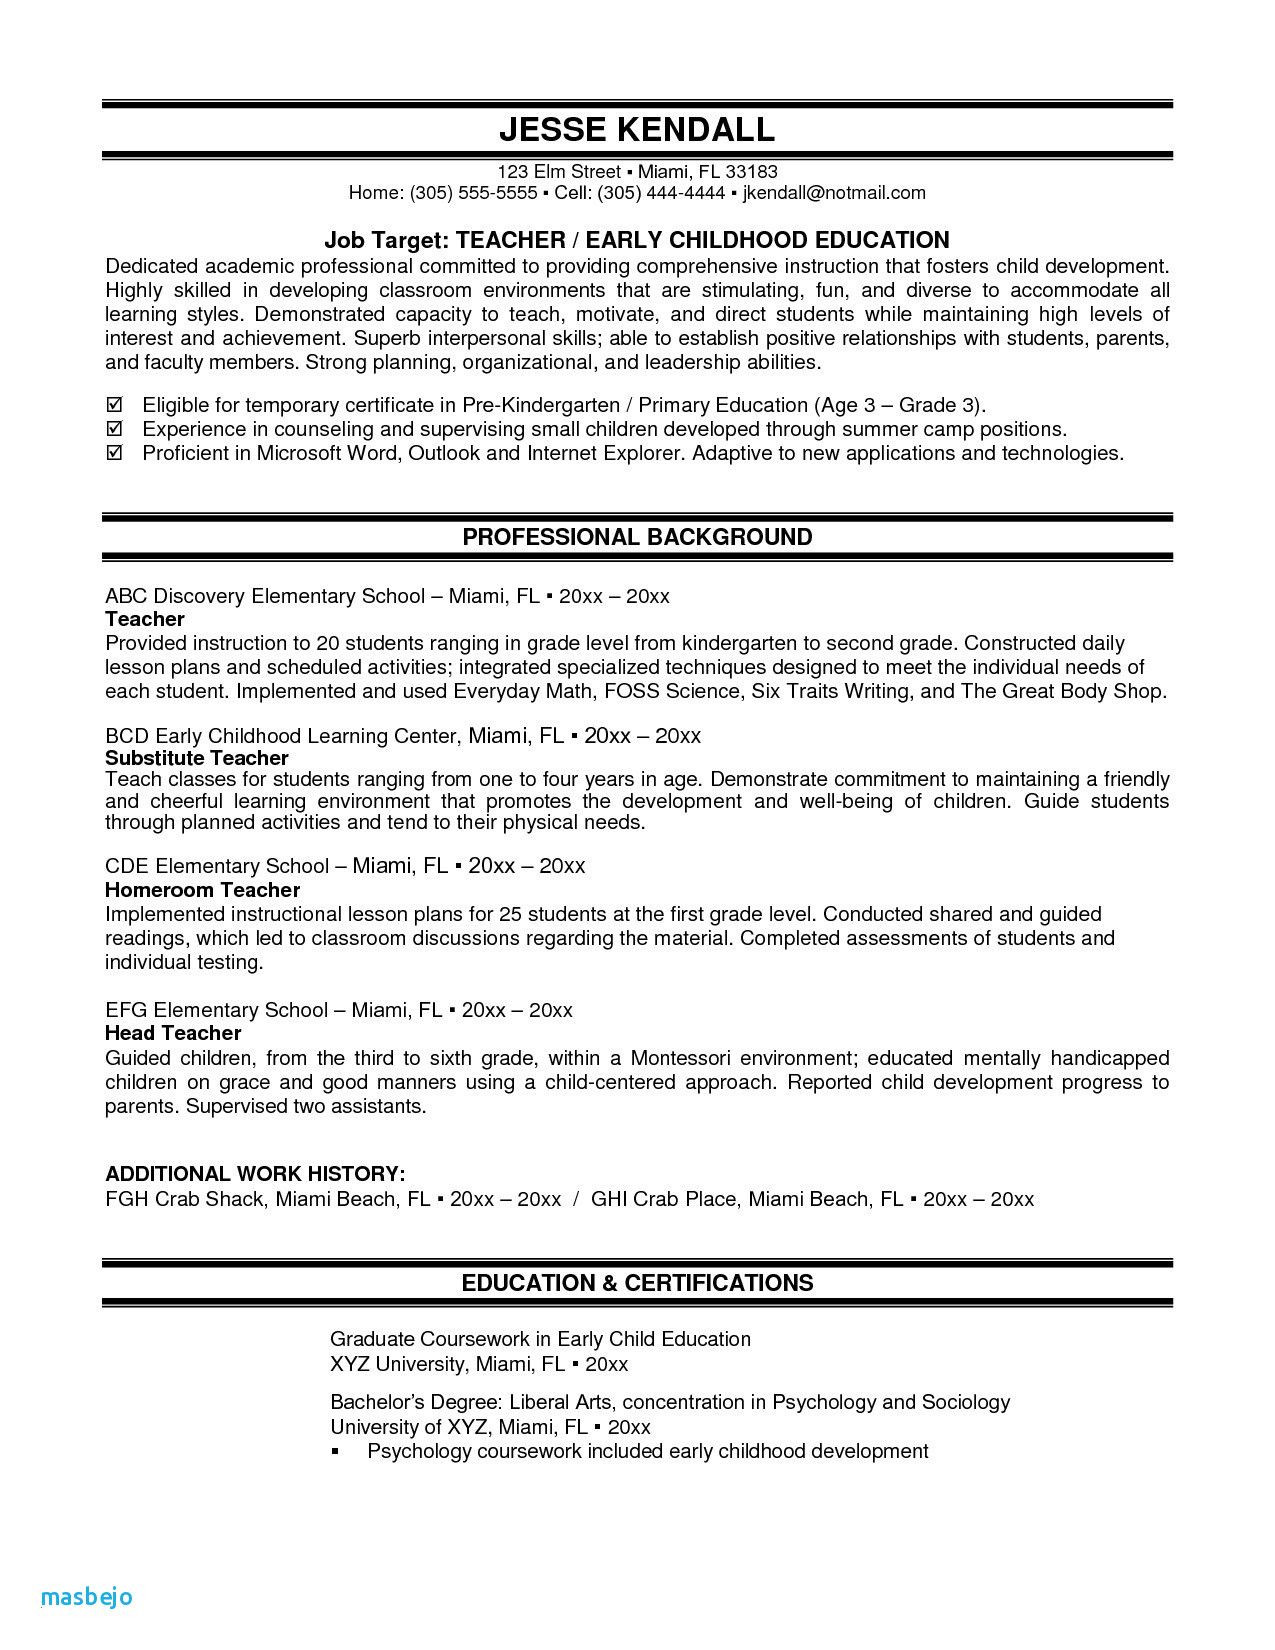 Child Care assistant Teacher Resume Sample 80 Beautiful Image Of Resume Examples Child Care assistant ...